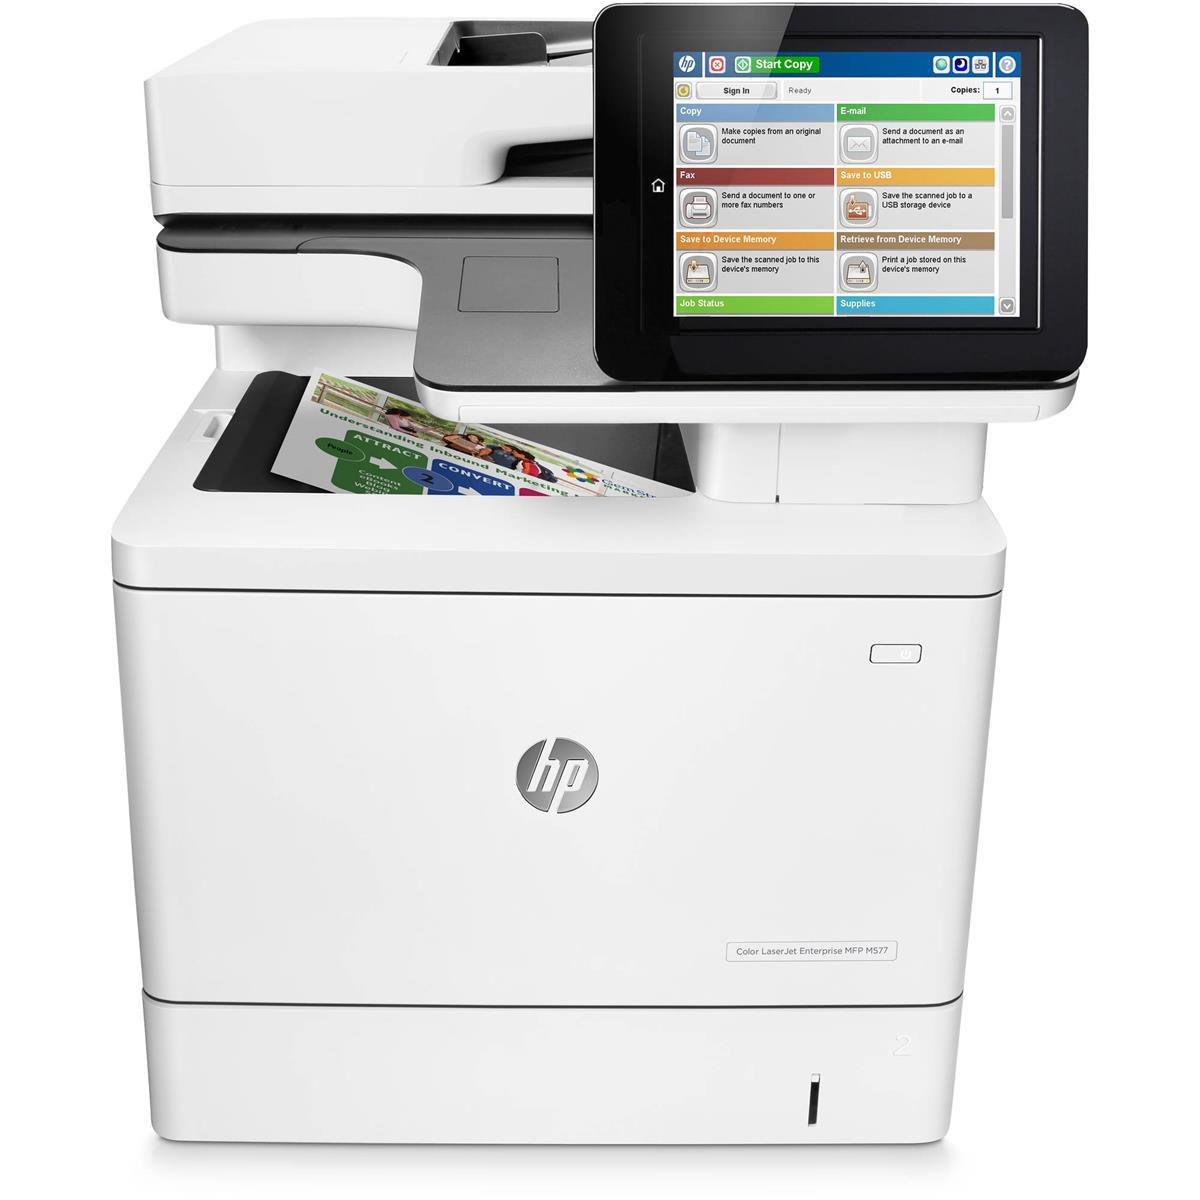 HP Color LaserJet Enterprise MFP M577dn Multifunction Color Printer